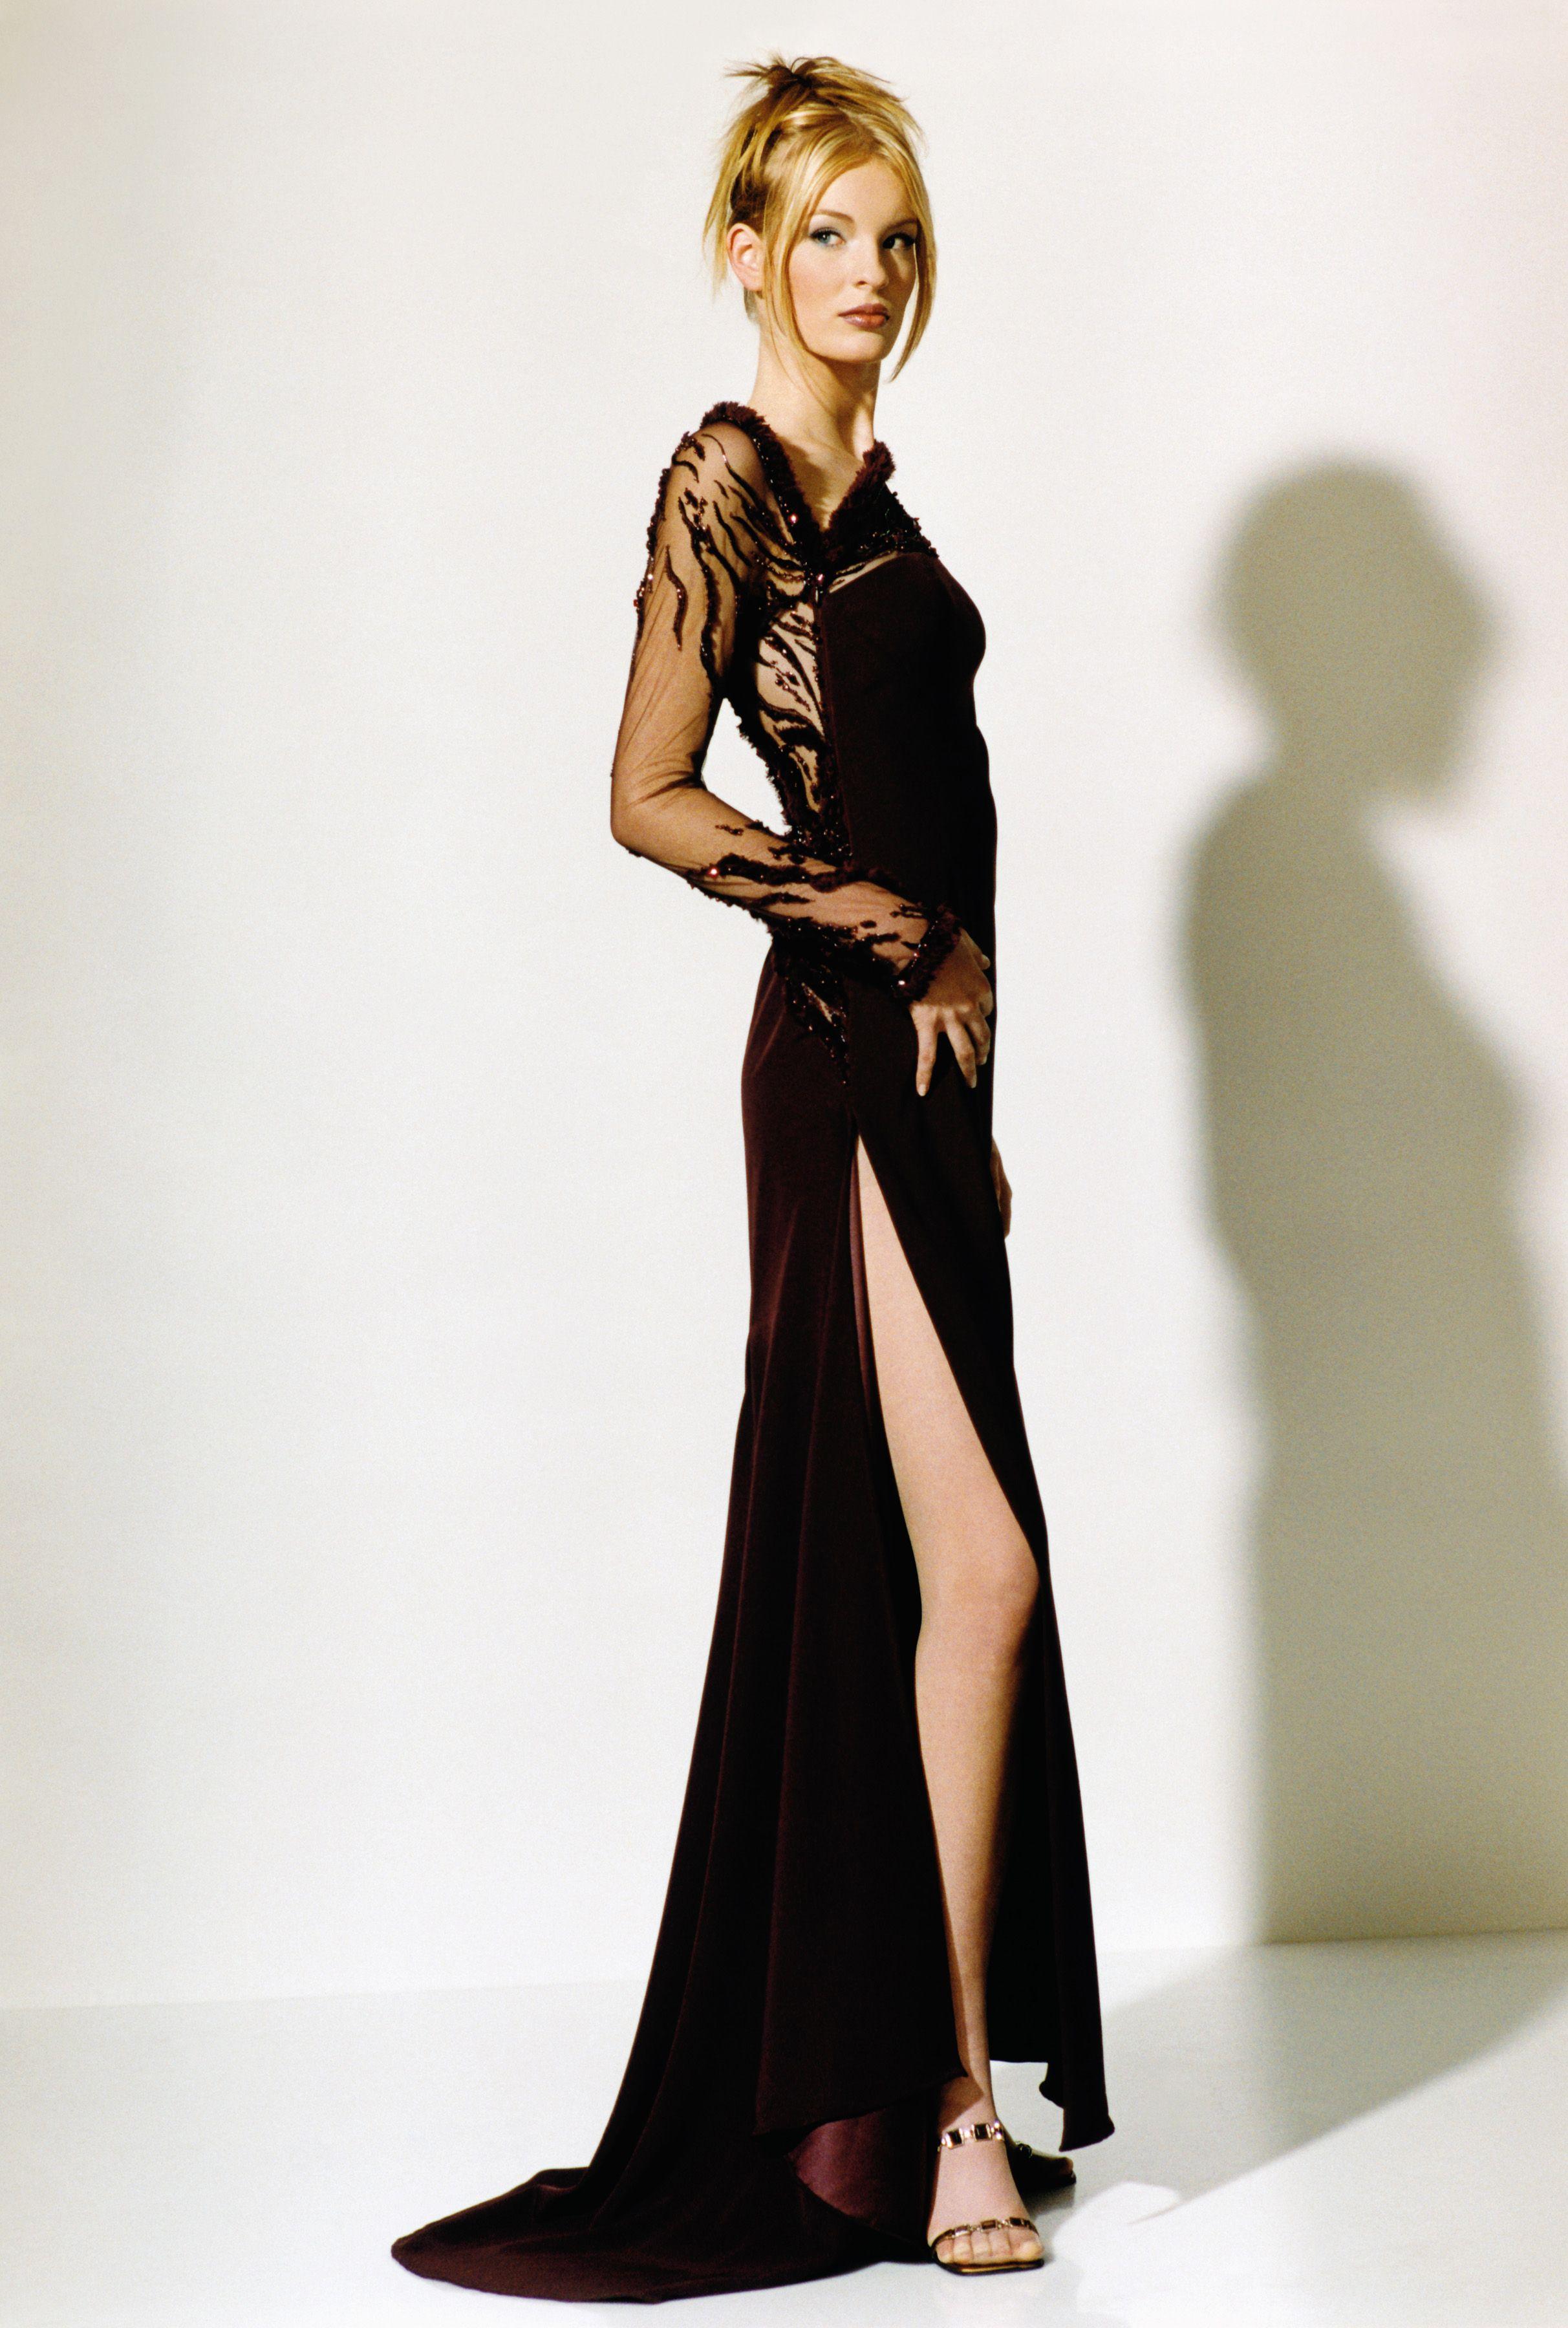 65ecb70b6ecd Haute Couture dress from Blanka Matragi s 20th anniversary collection